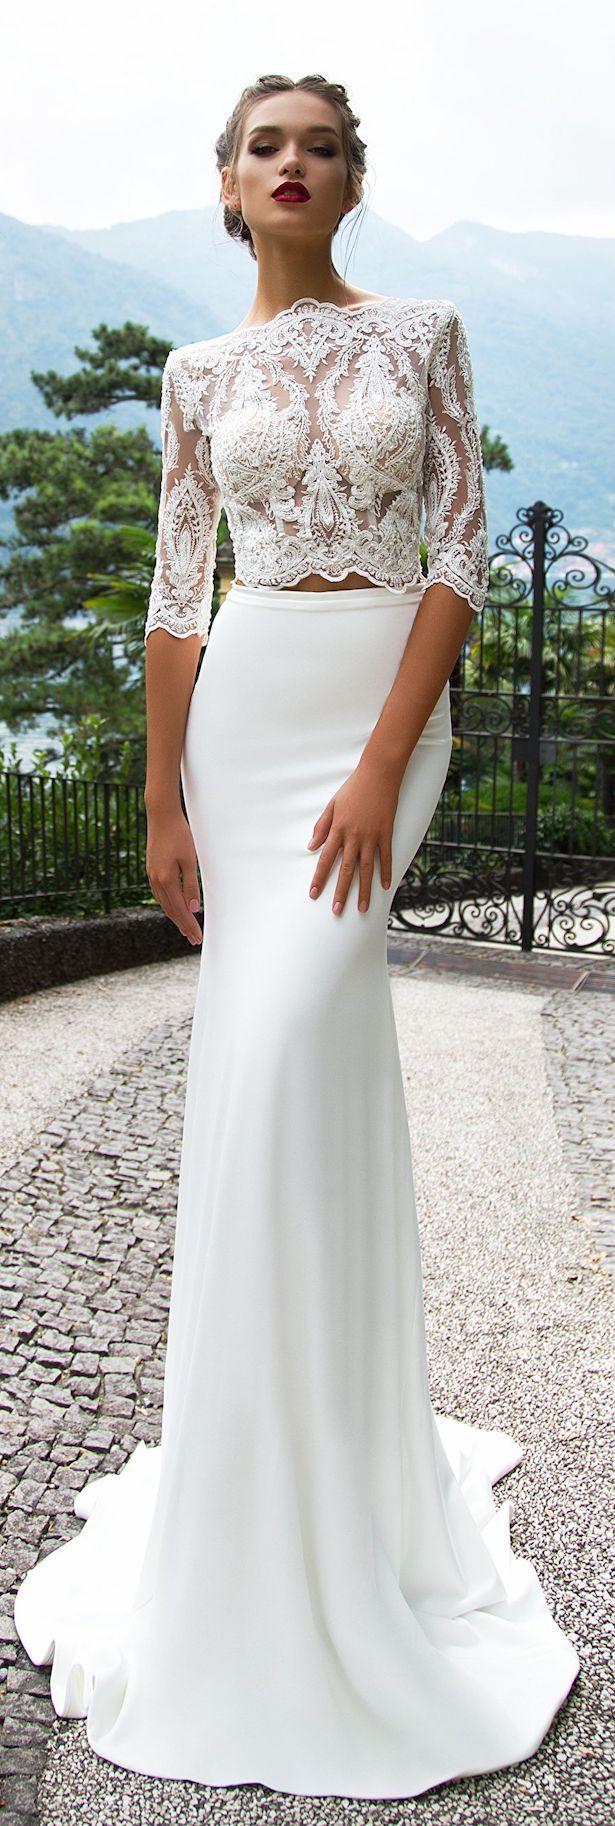 Wedding dresses by milla nova white desire 2017 bridal collection wedding dress by milla nova white desire 2017 bridal collection merill junglespirit Image collections